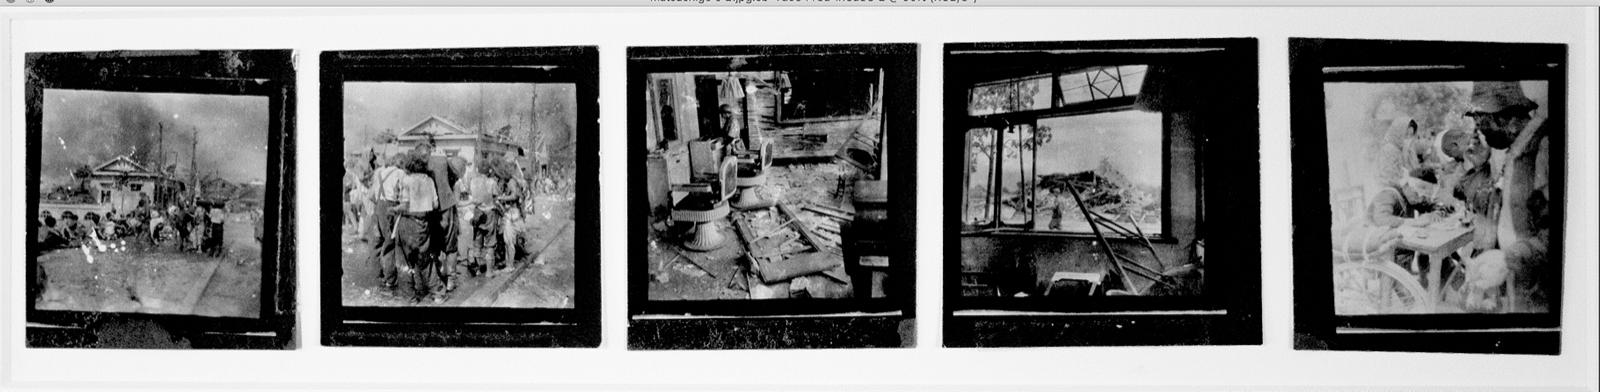 5 Matsushige's 5 Hiroshima photos